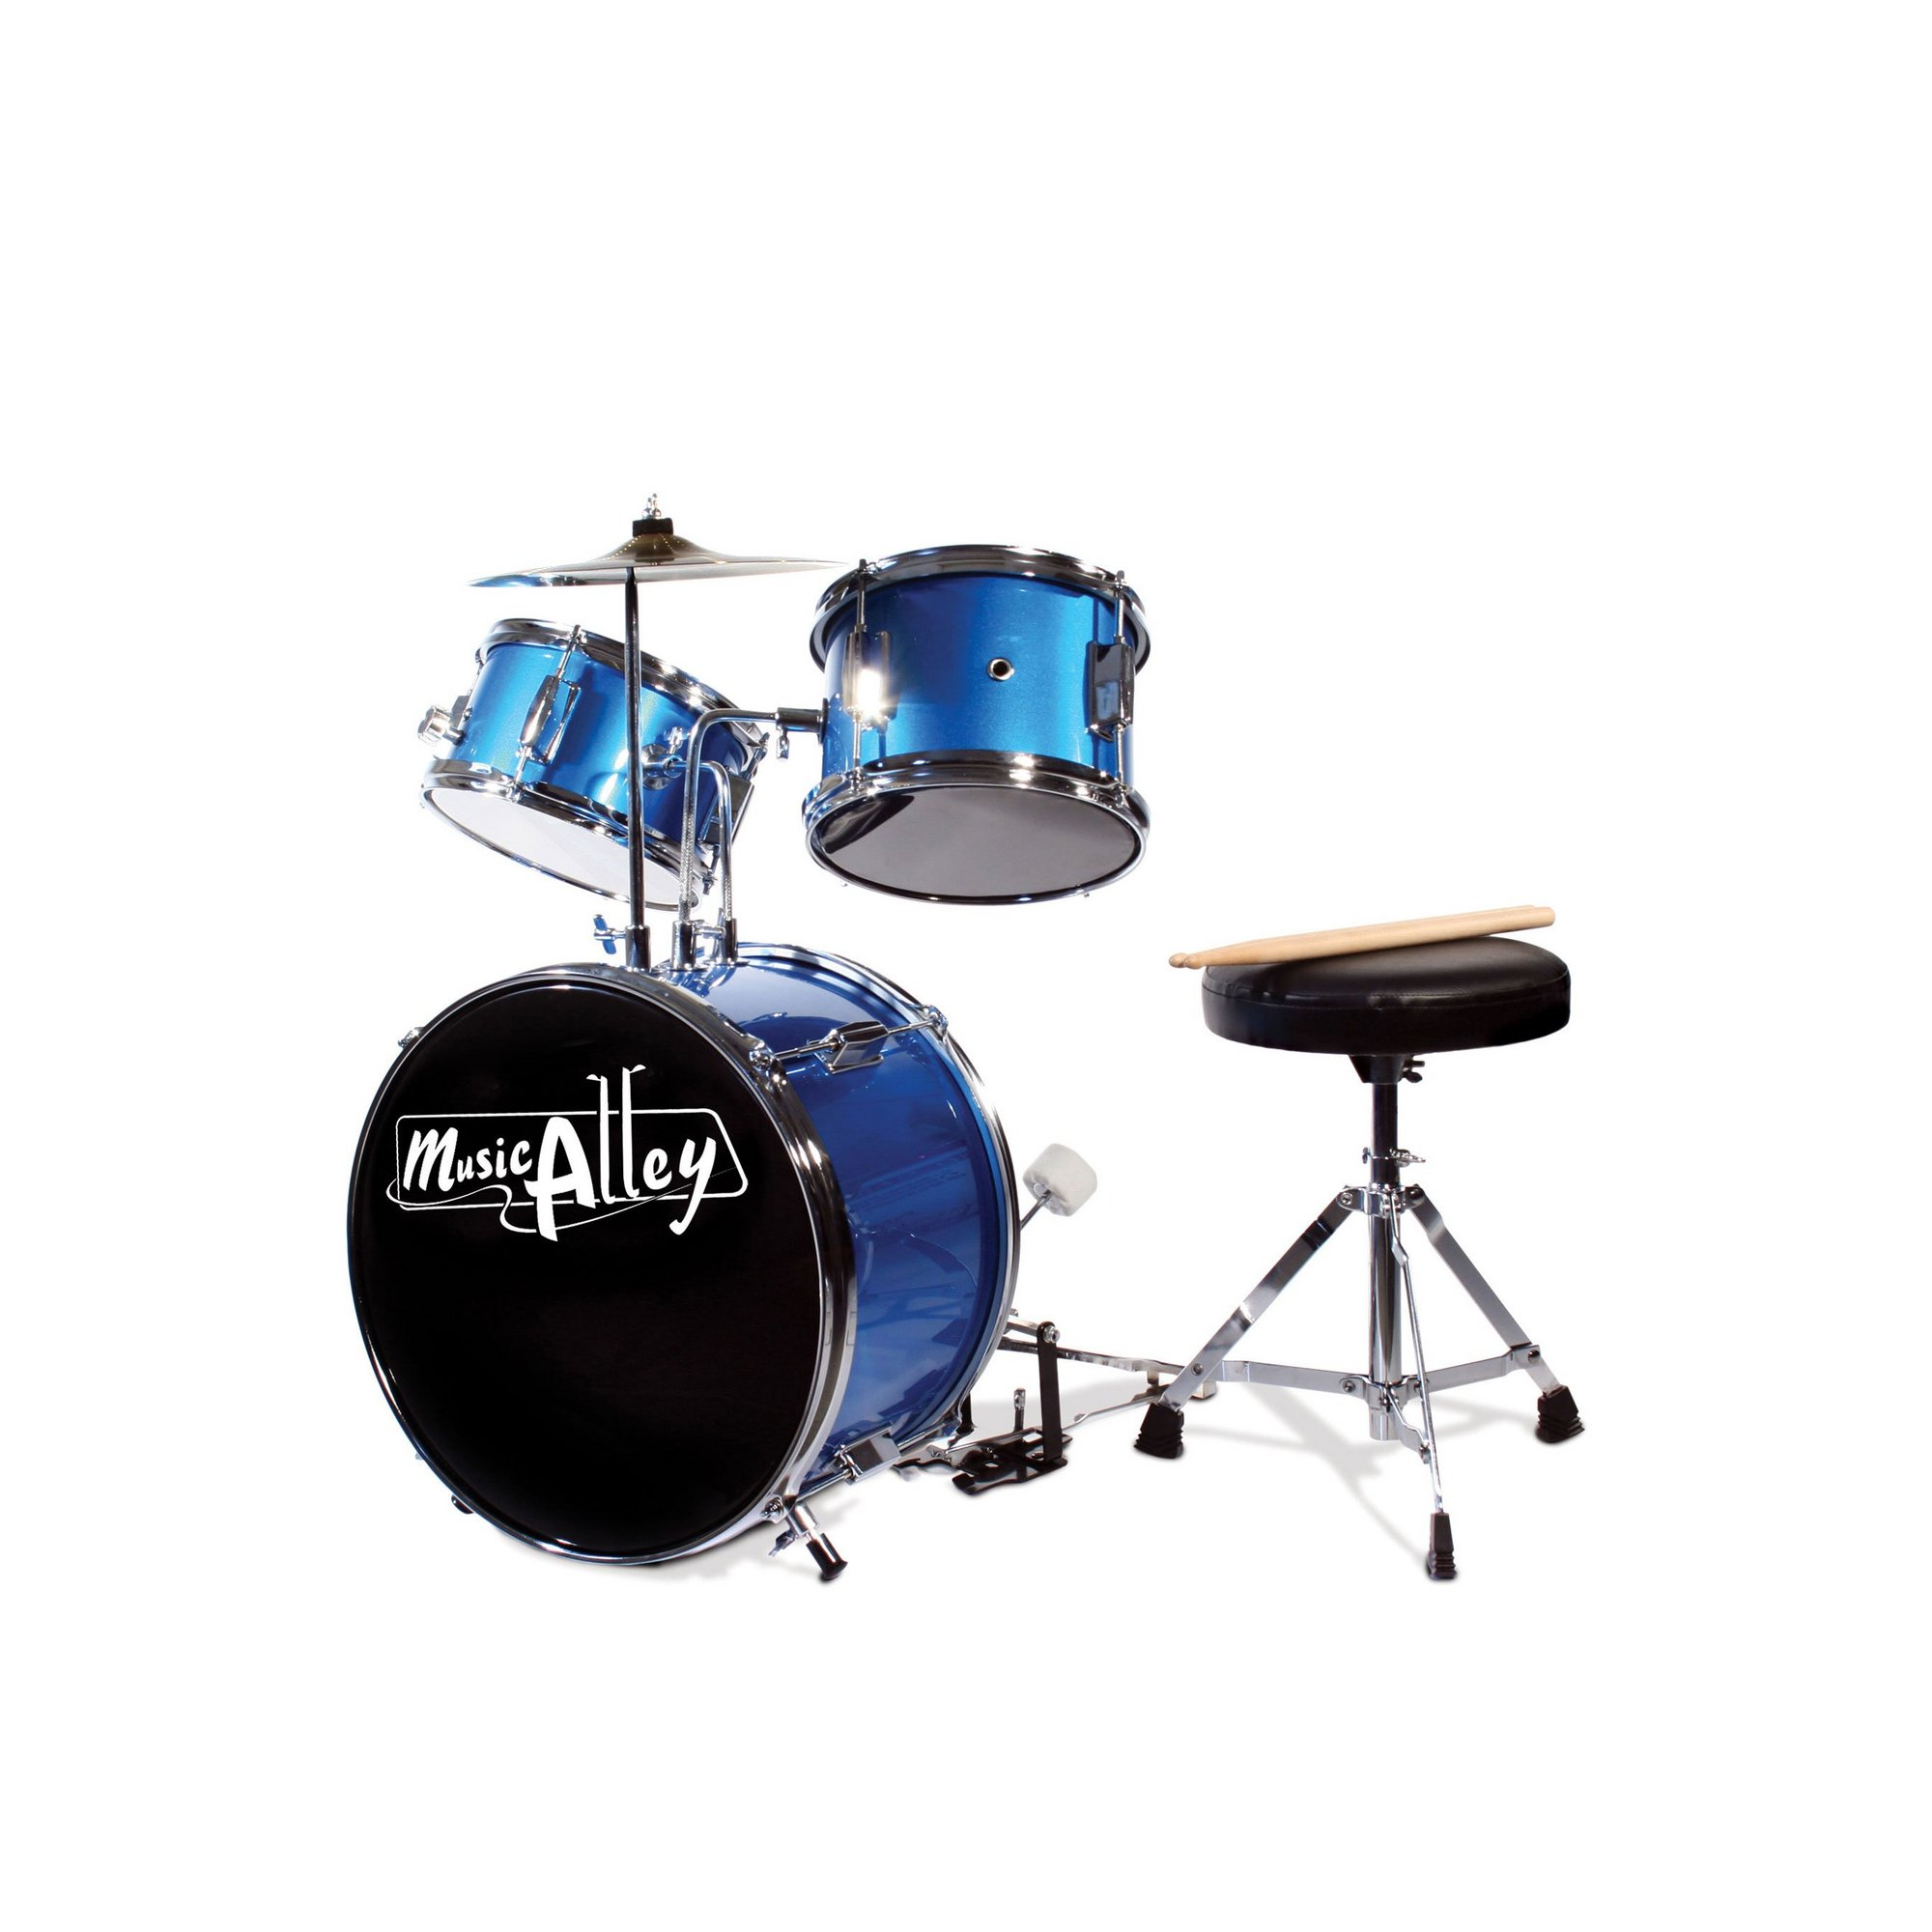 Image of Music Alley Junior Drum Kit